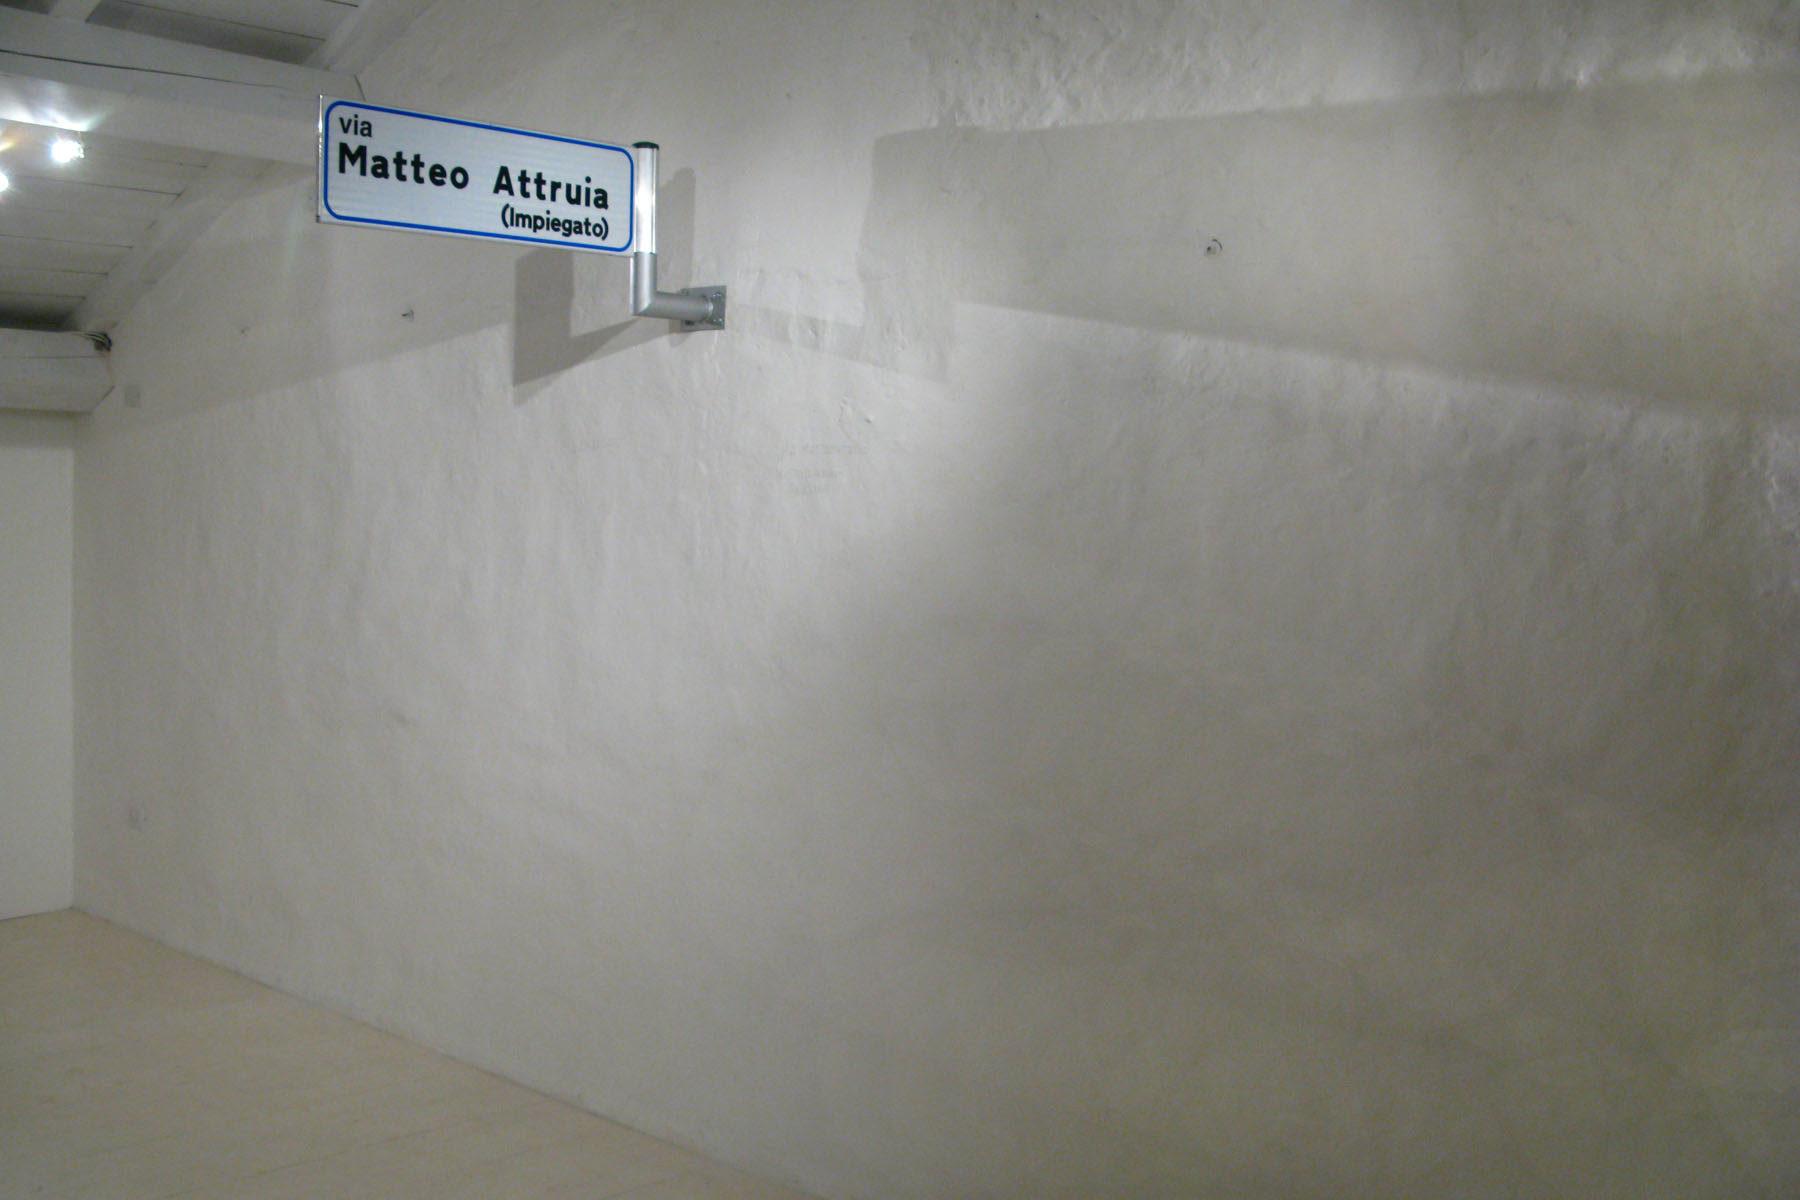 Matteo Attruia, via matteo attruia impiegato-artista,digital print, aluminium, 25 x 86 cm (b)